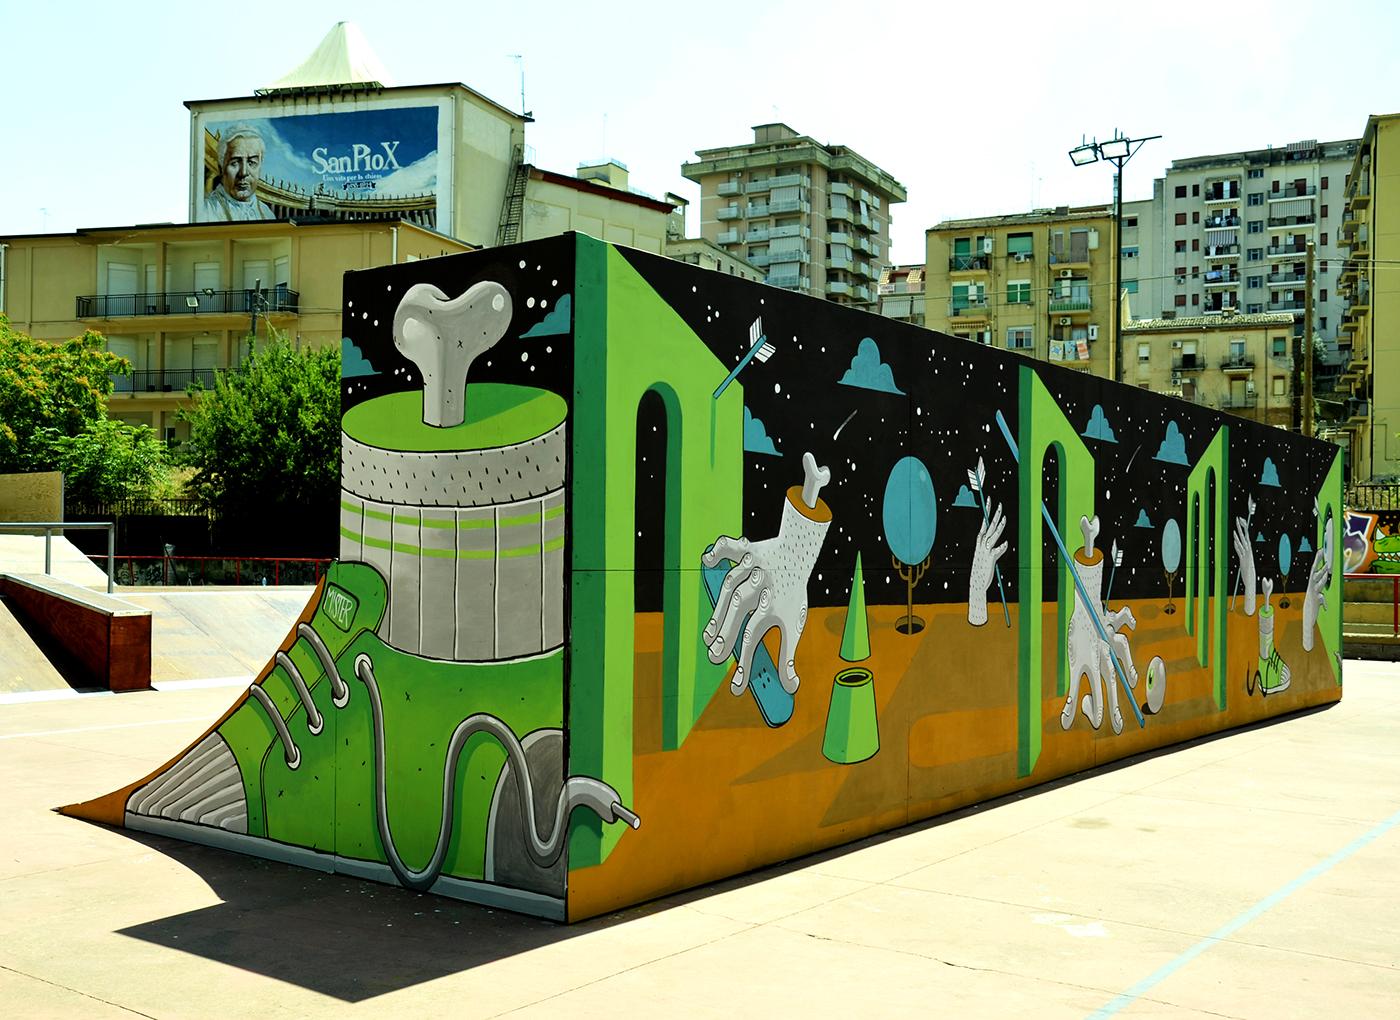 diego della posta mister thoms street art skatepark2 - Mister Thoms : skatepark arty et fresque 3D